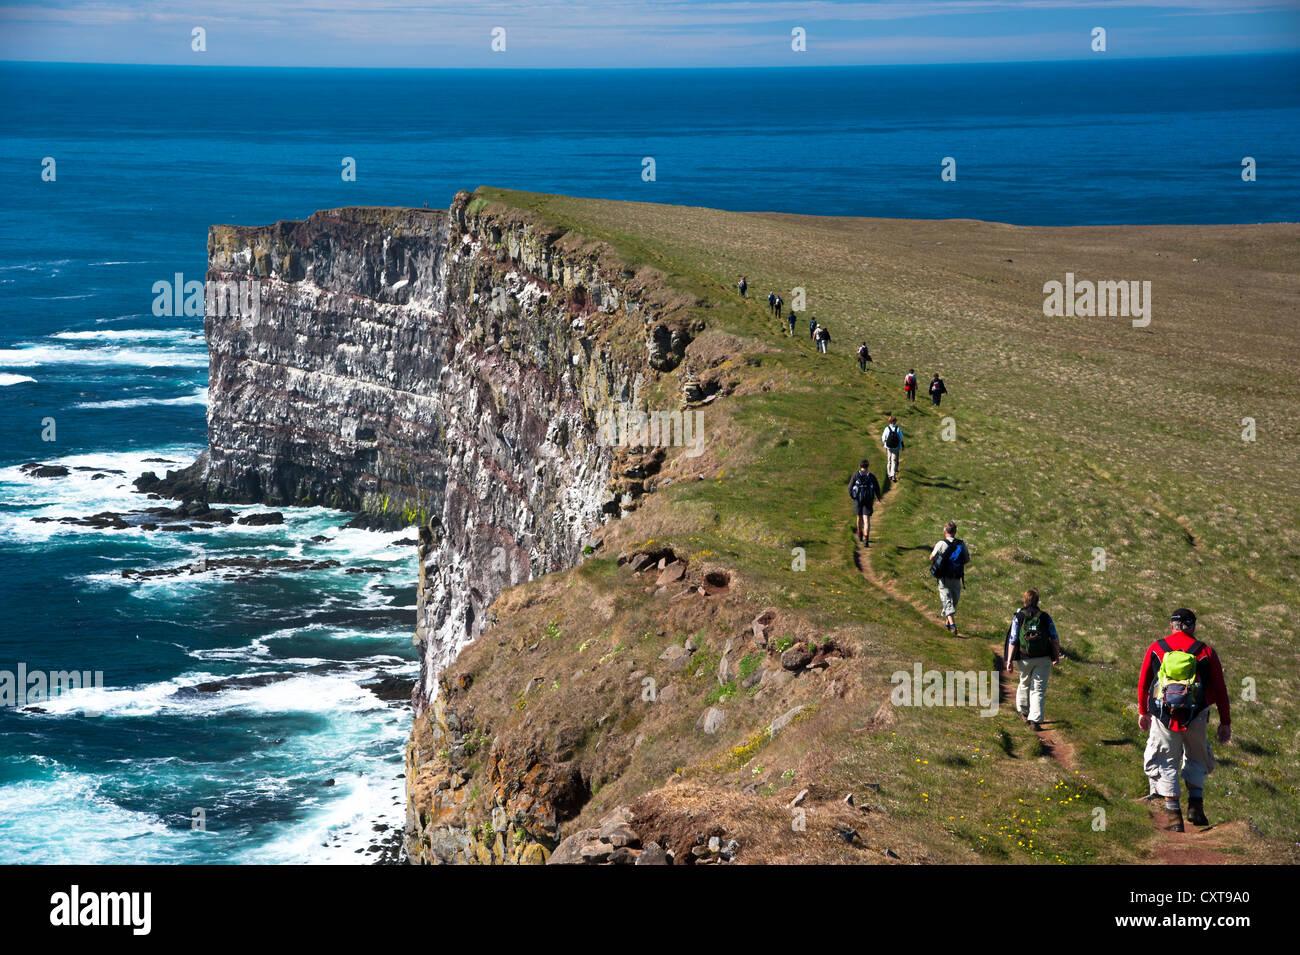 Trekking group on the bird cliffs of Látrabjarg, Westfjords, Iceland, Europe - Stock Image